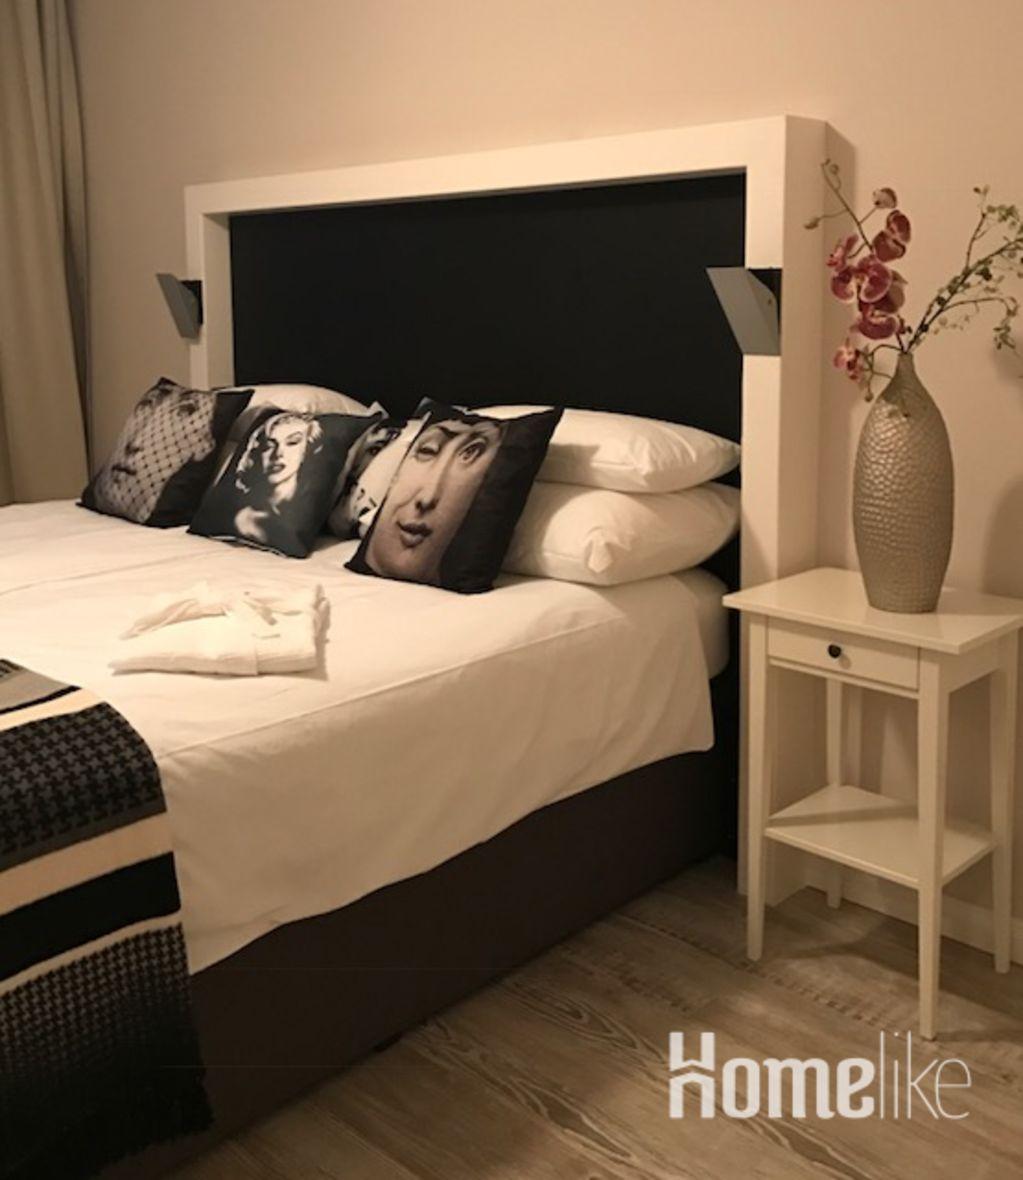 image 9 furnished 1 bedroom Apartment for rent in Kelkheim, Main-Taunus-Kreis